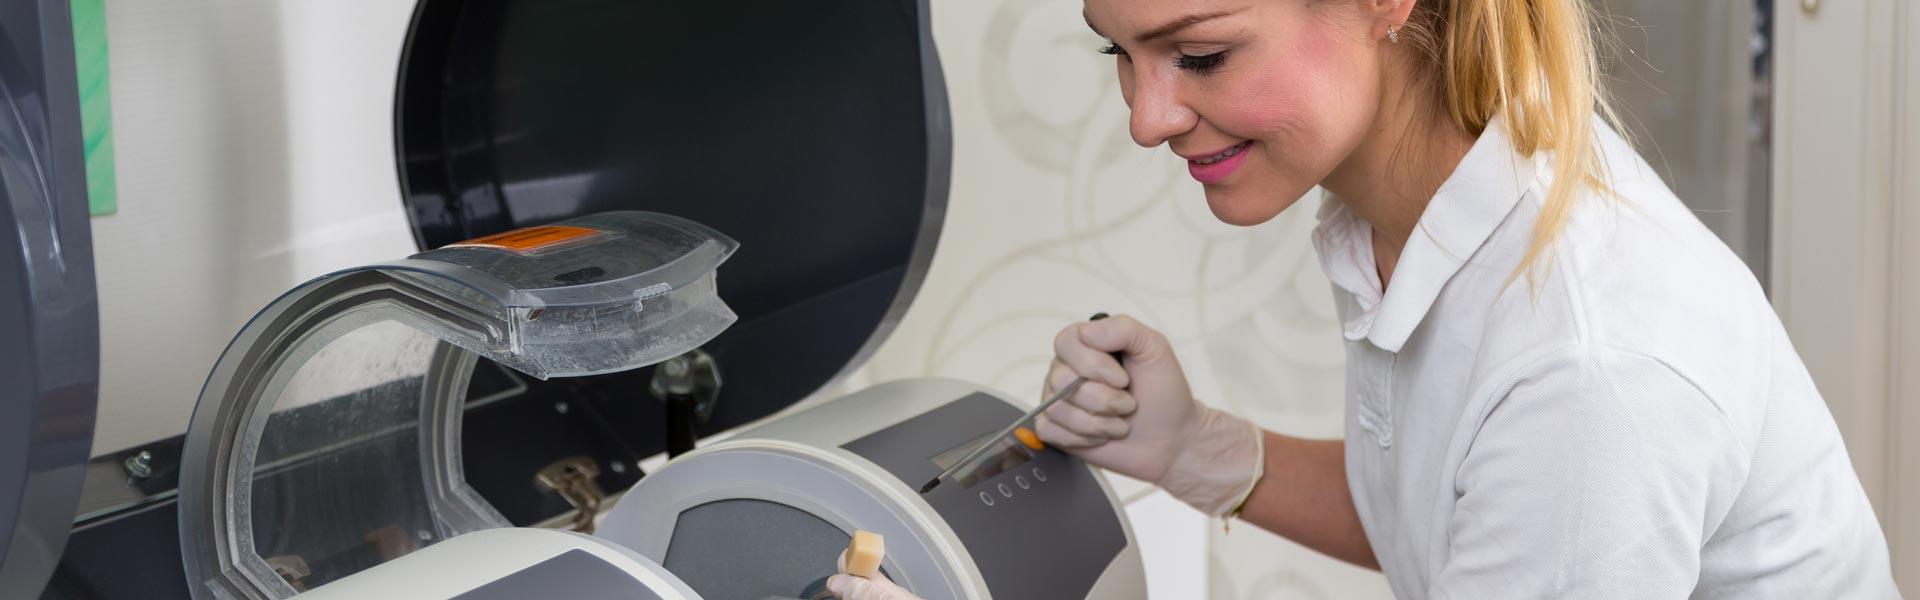 Dental assistant operating CEREC® machine